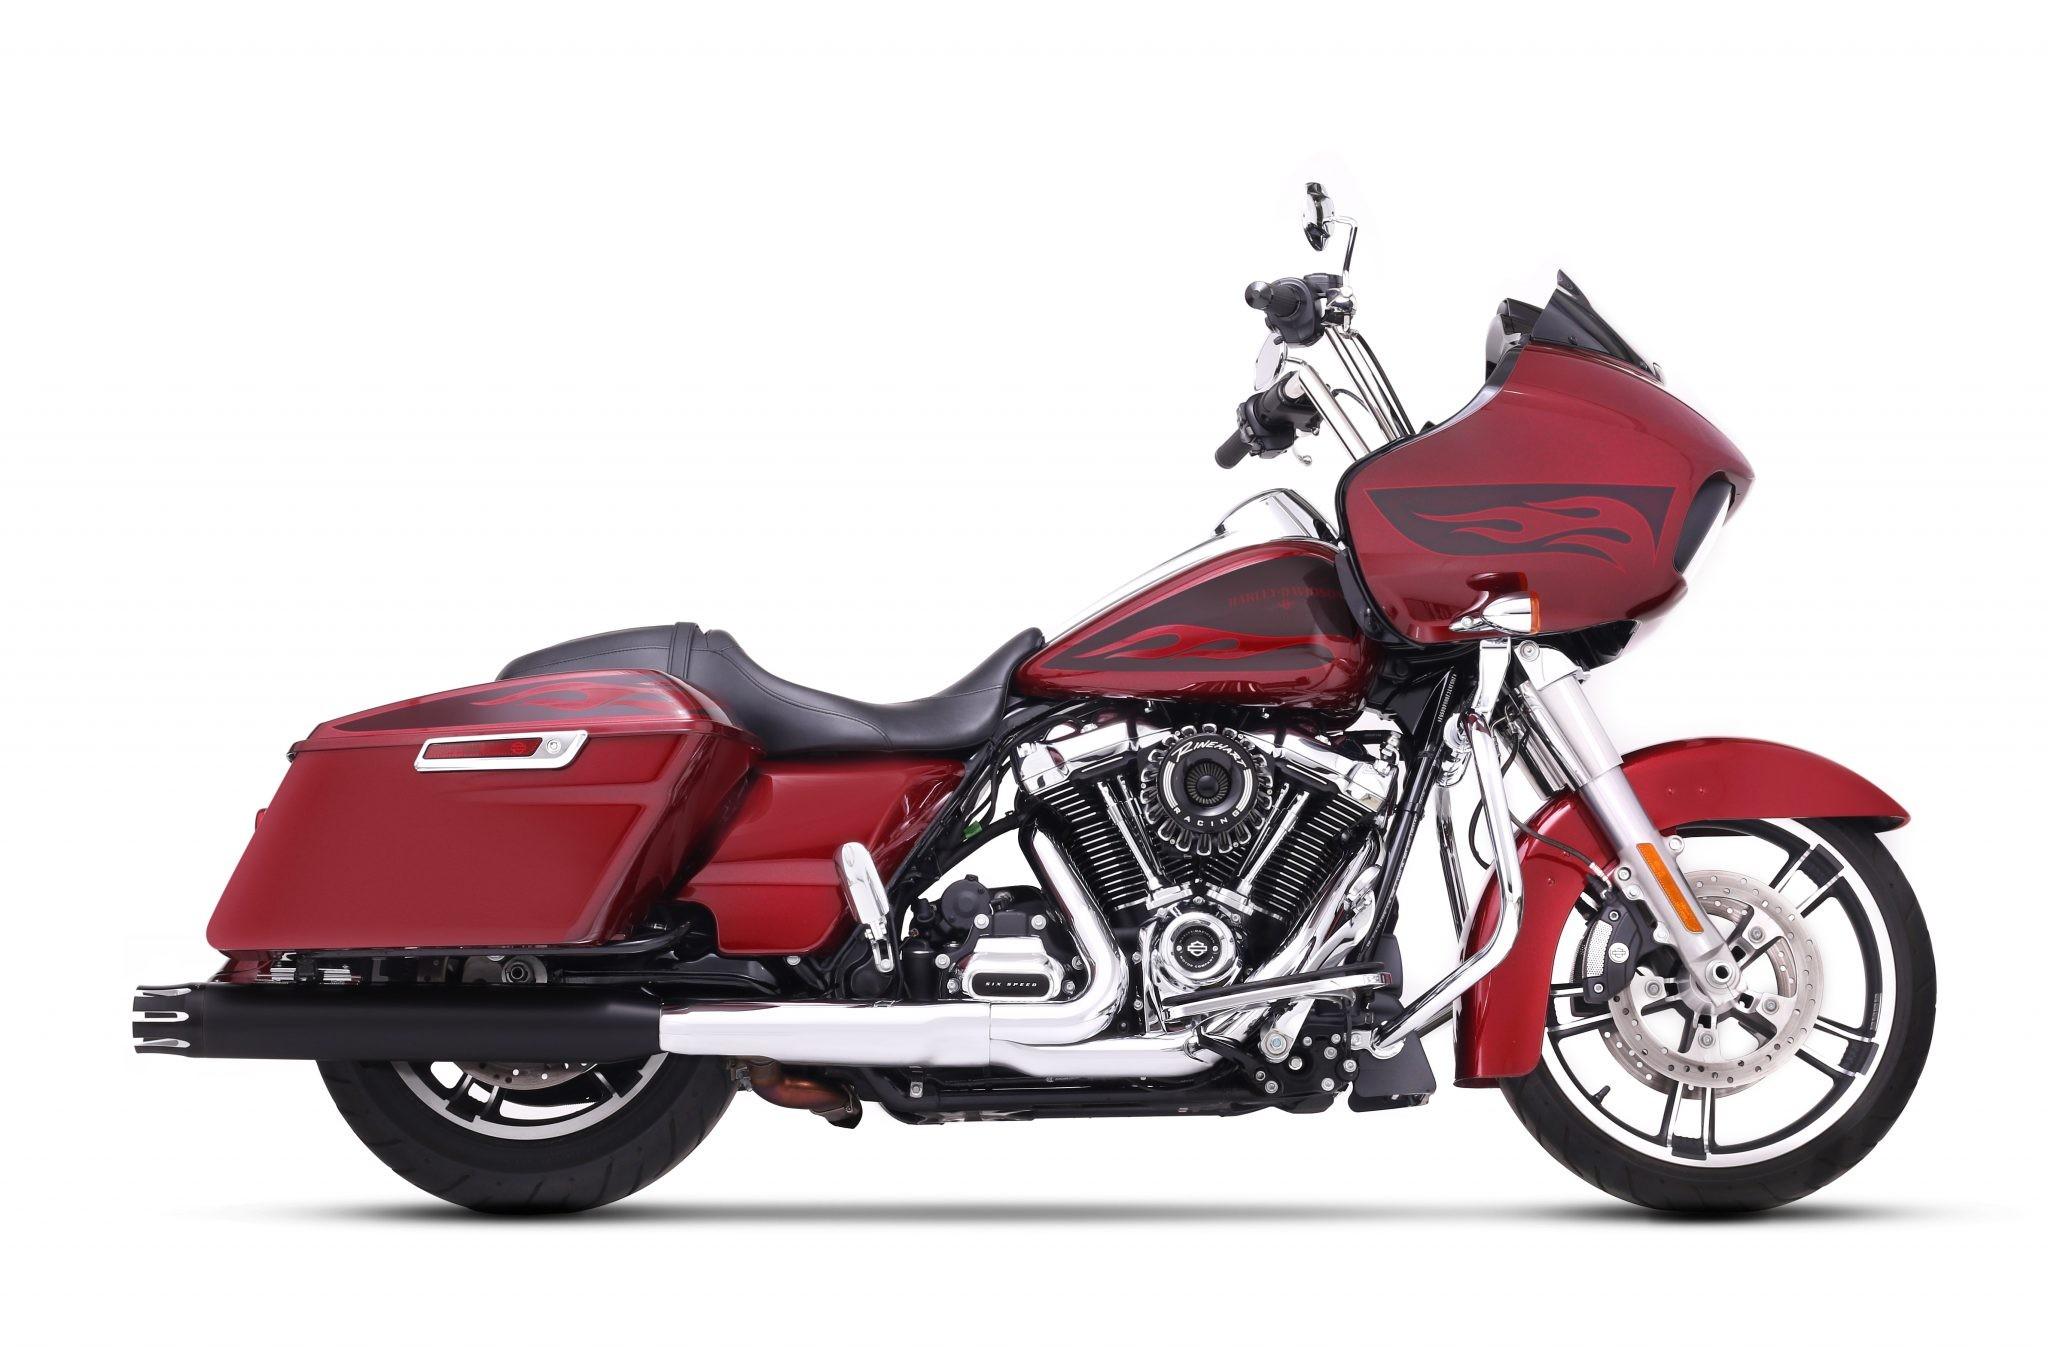 "Harley Davidson Motorcycle Parts Diagram 4"" Slip Exhaust for Harley touring Of Harley Davidson Motorcycle Parts Diagram"